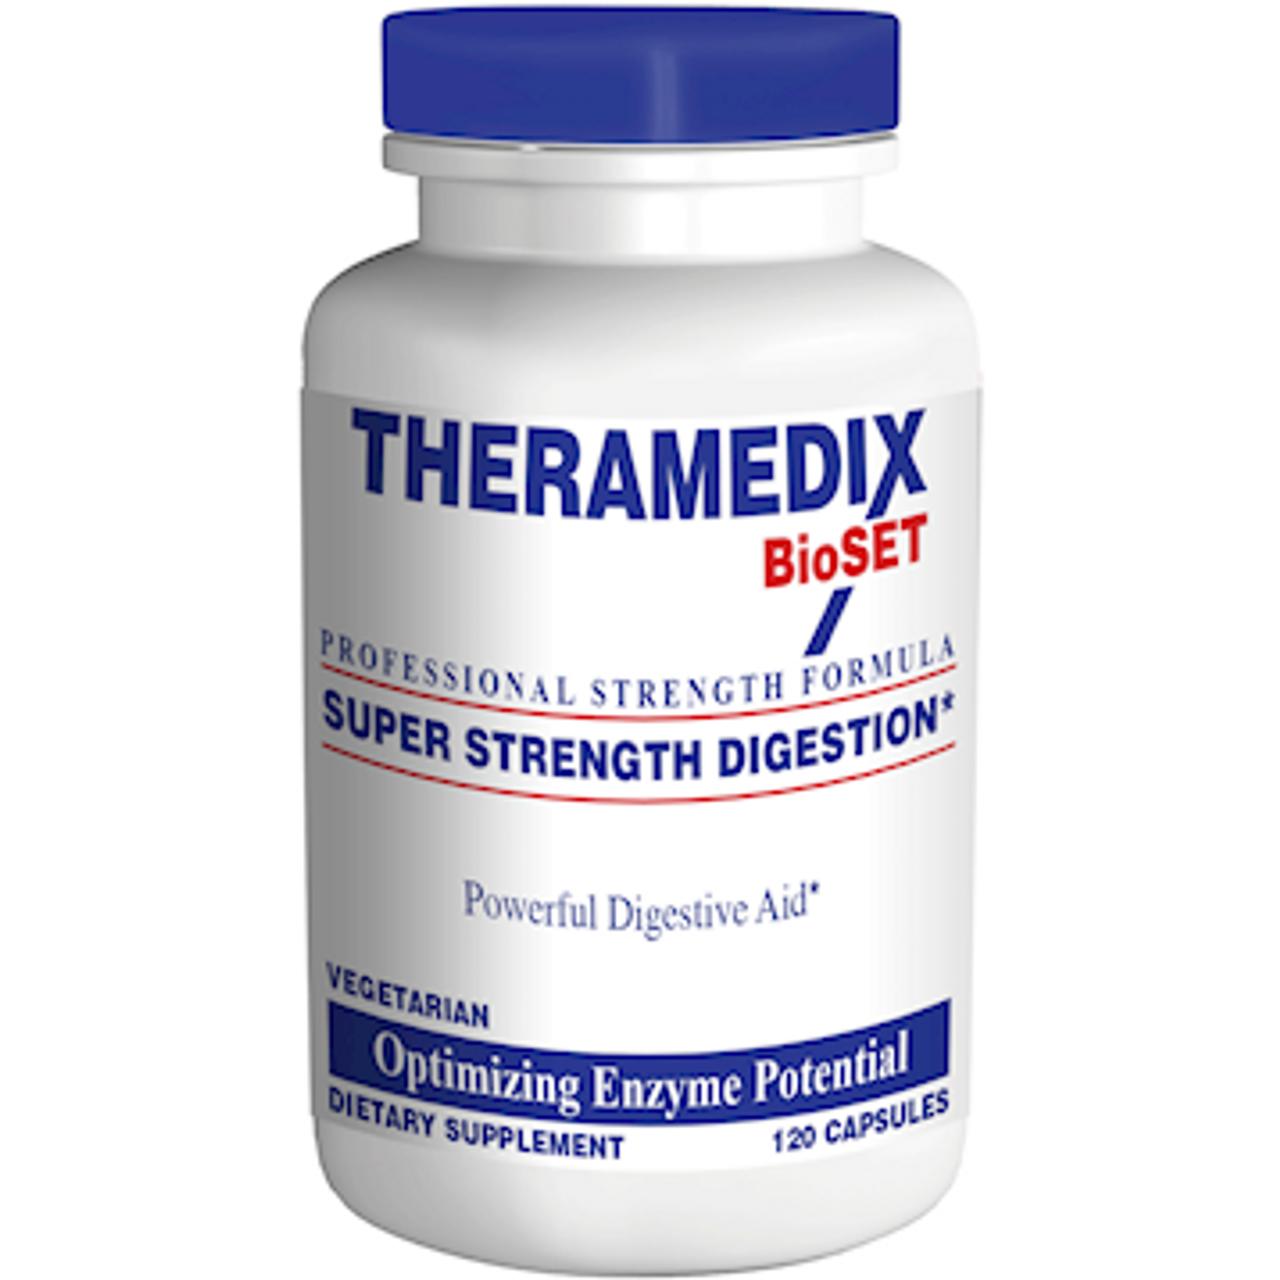 Theramedix BioSet Super Strength Digestion (Formerly DGX) 120 caps